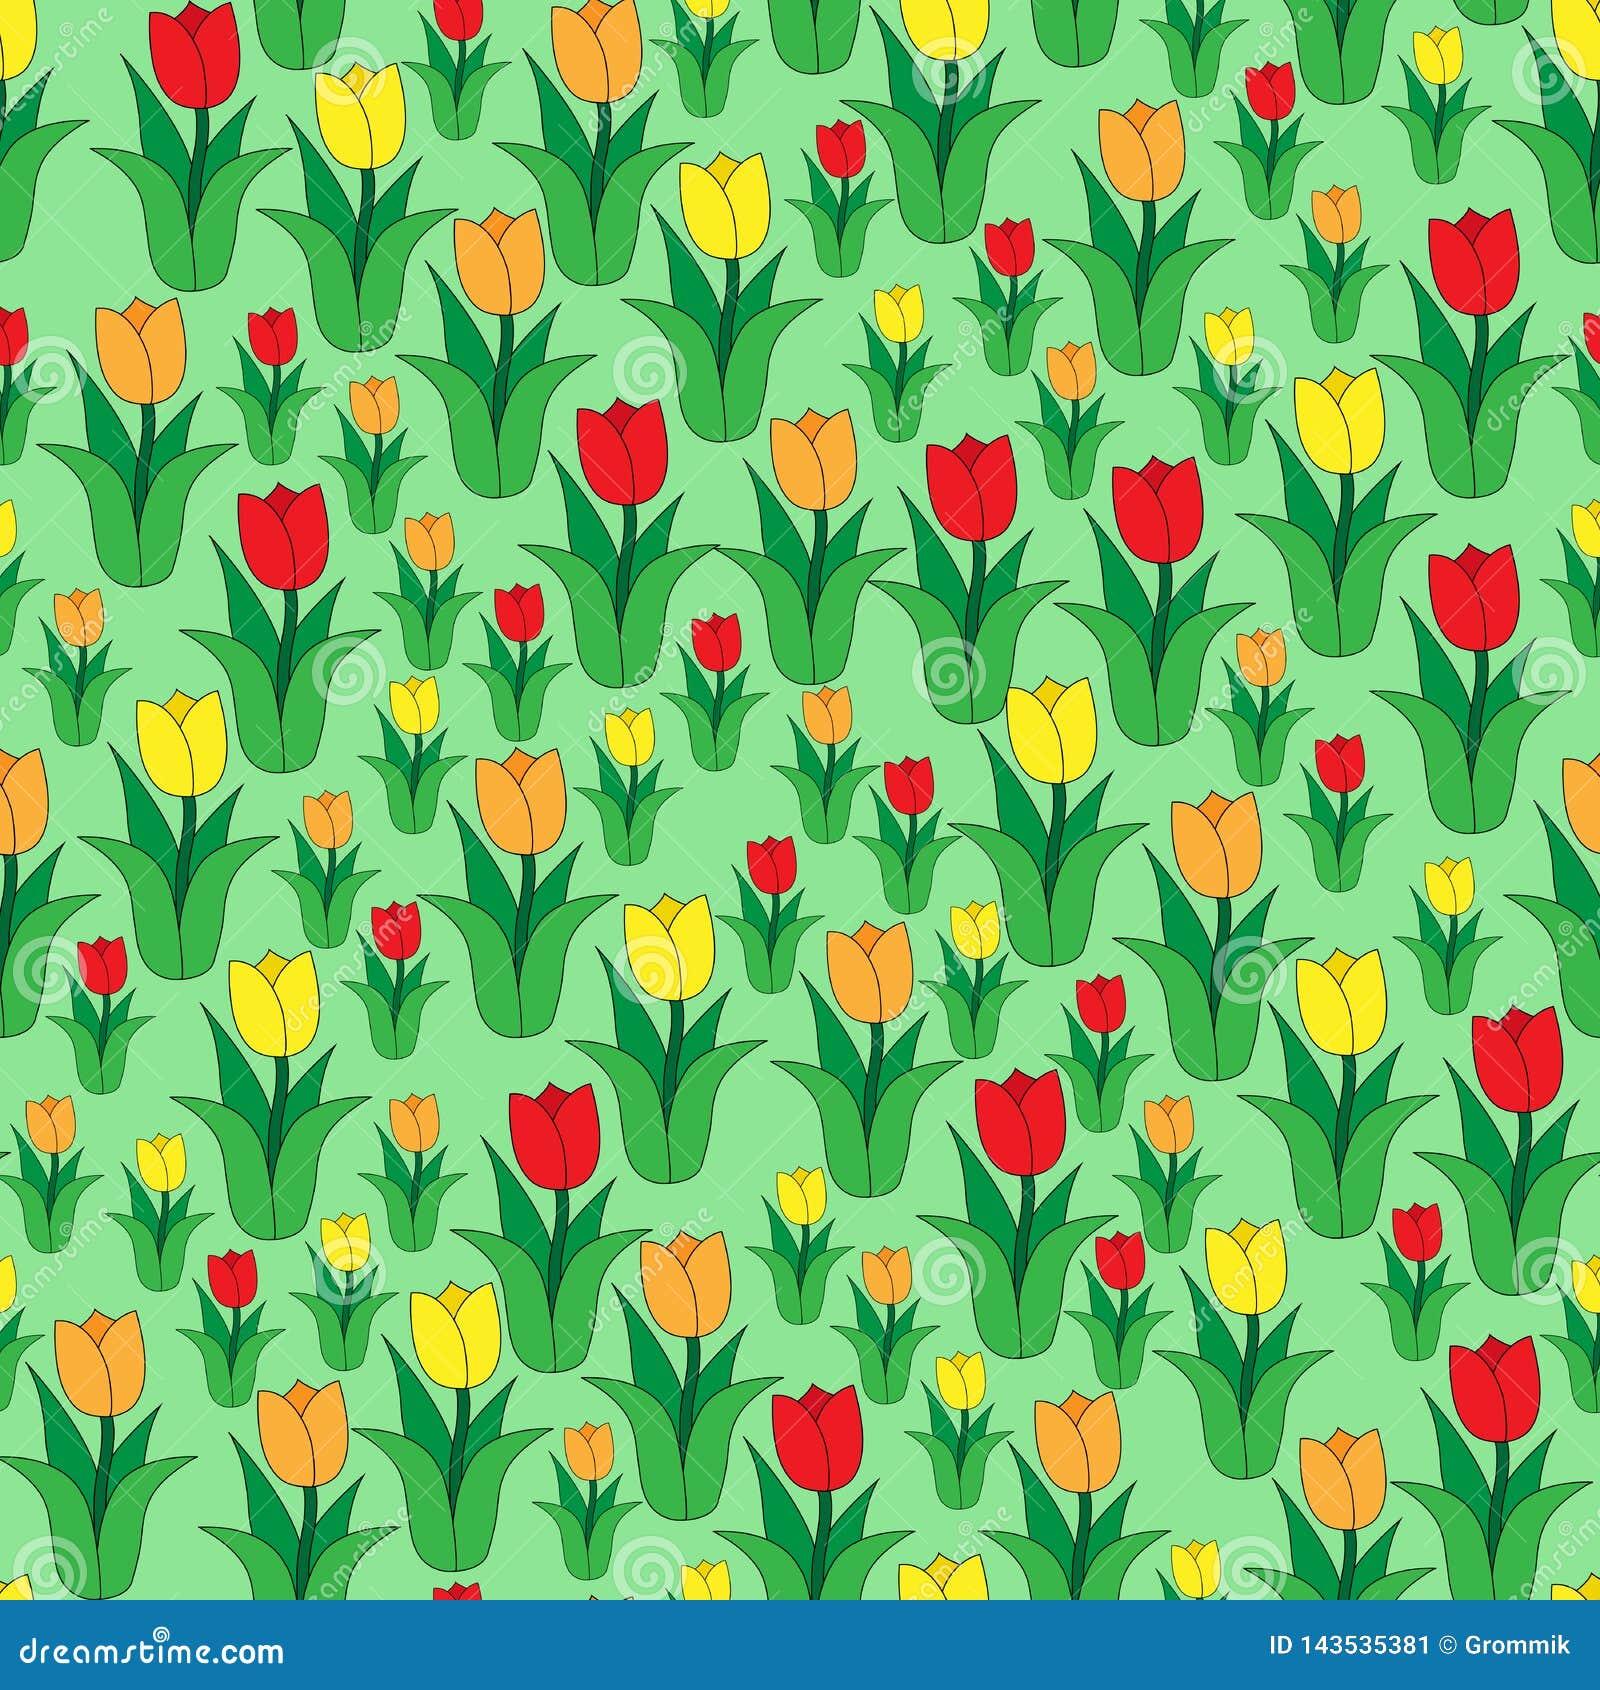 Naadloos kleurenpatroon van multi-colored tulpen